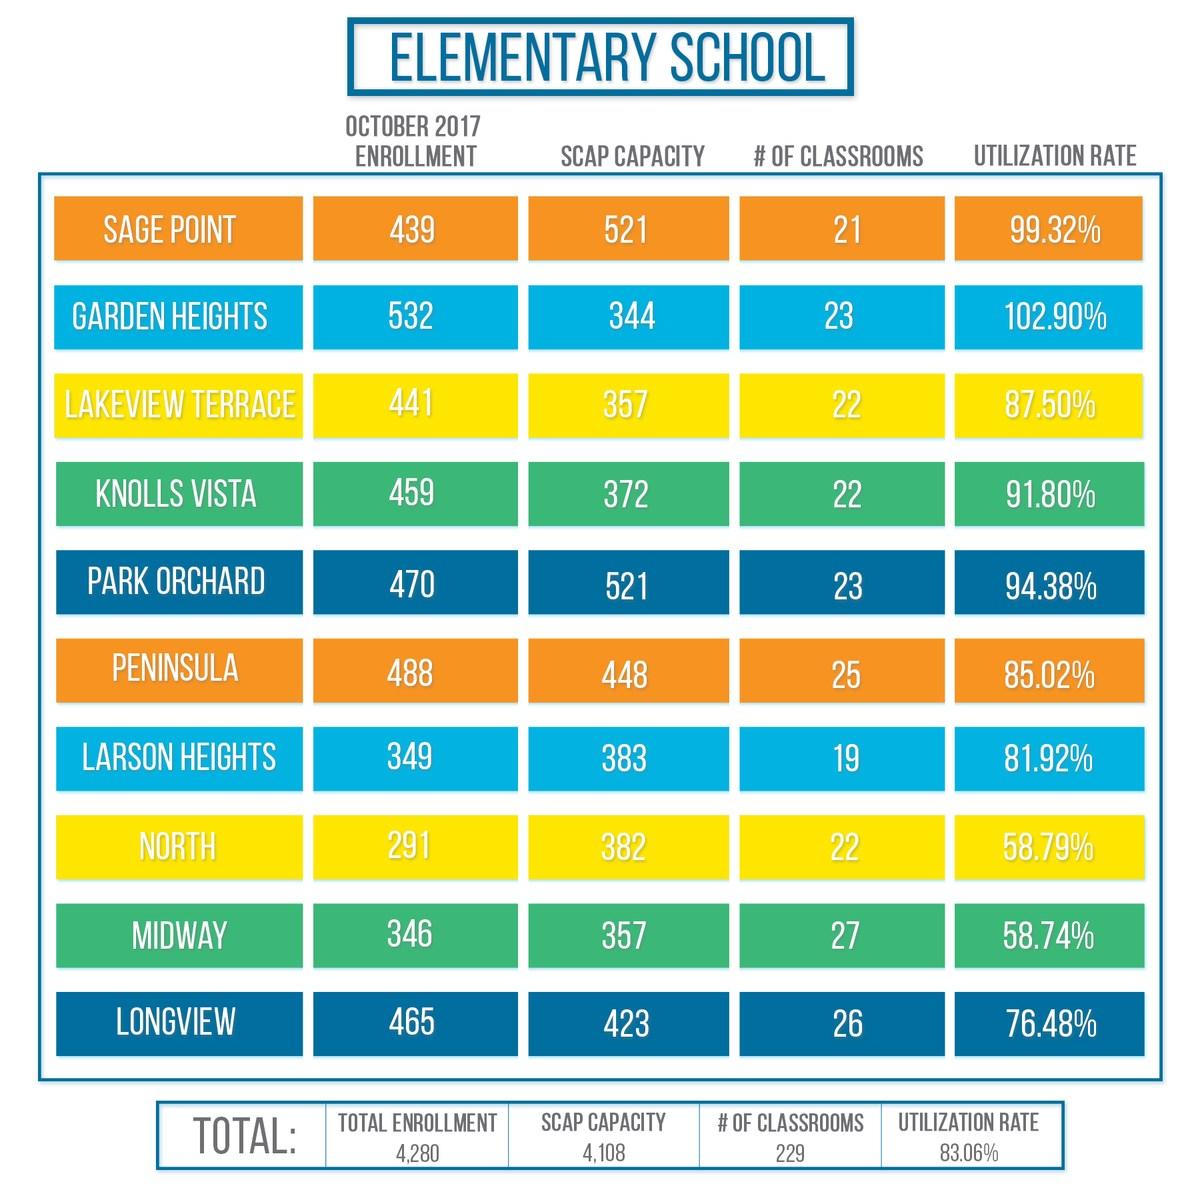 Elementary Utilization Rate